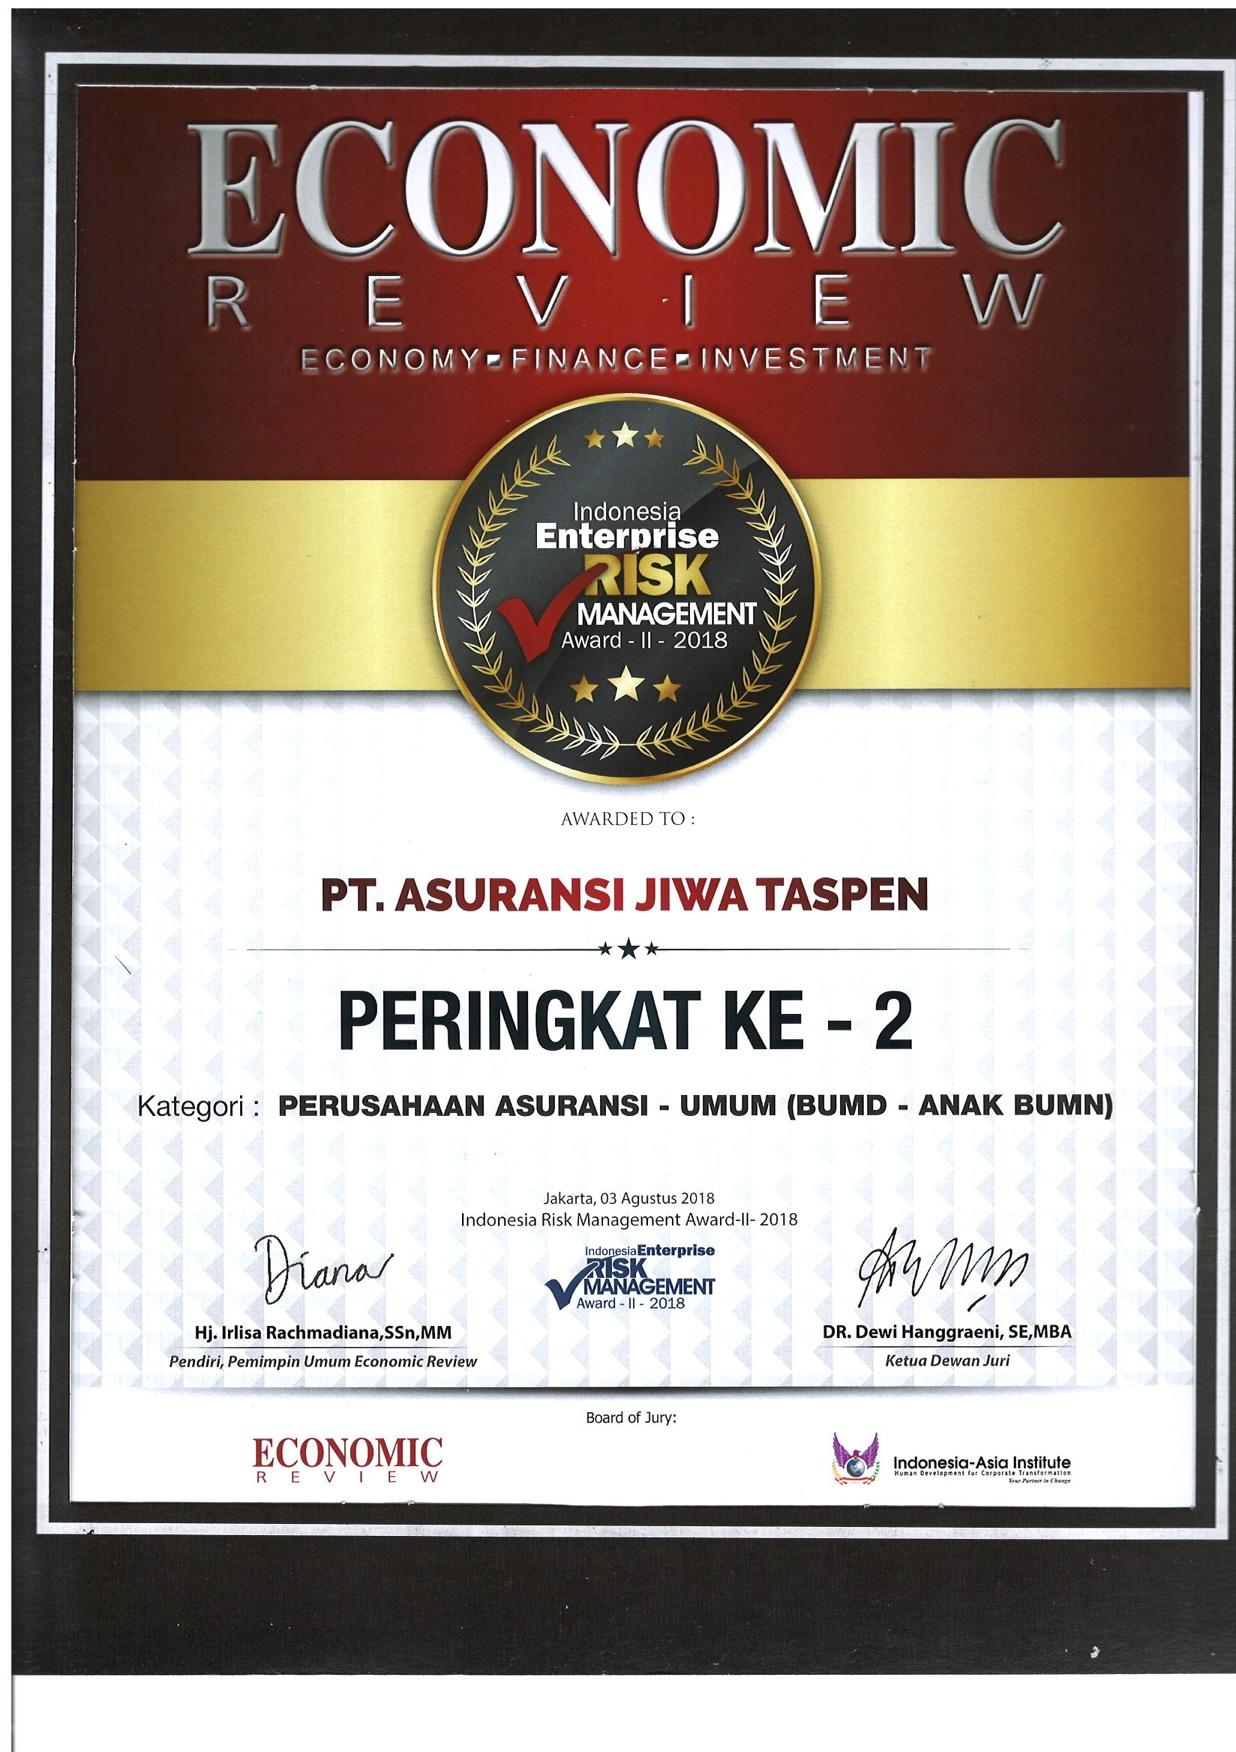 IERMA Ranking - Economic Review